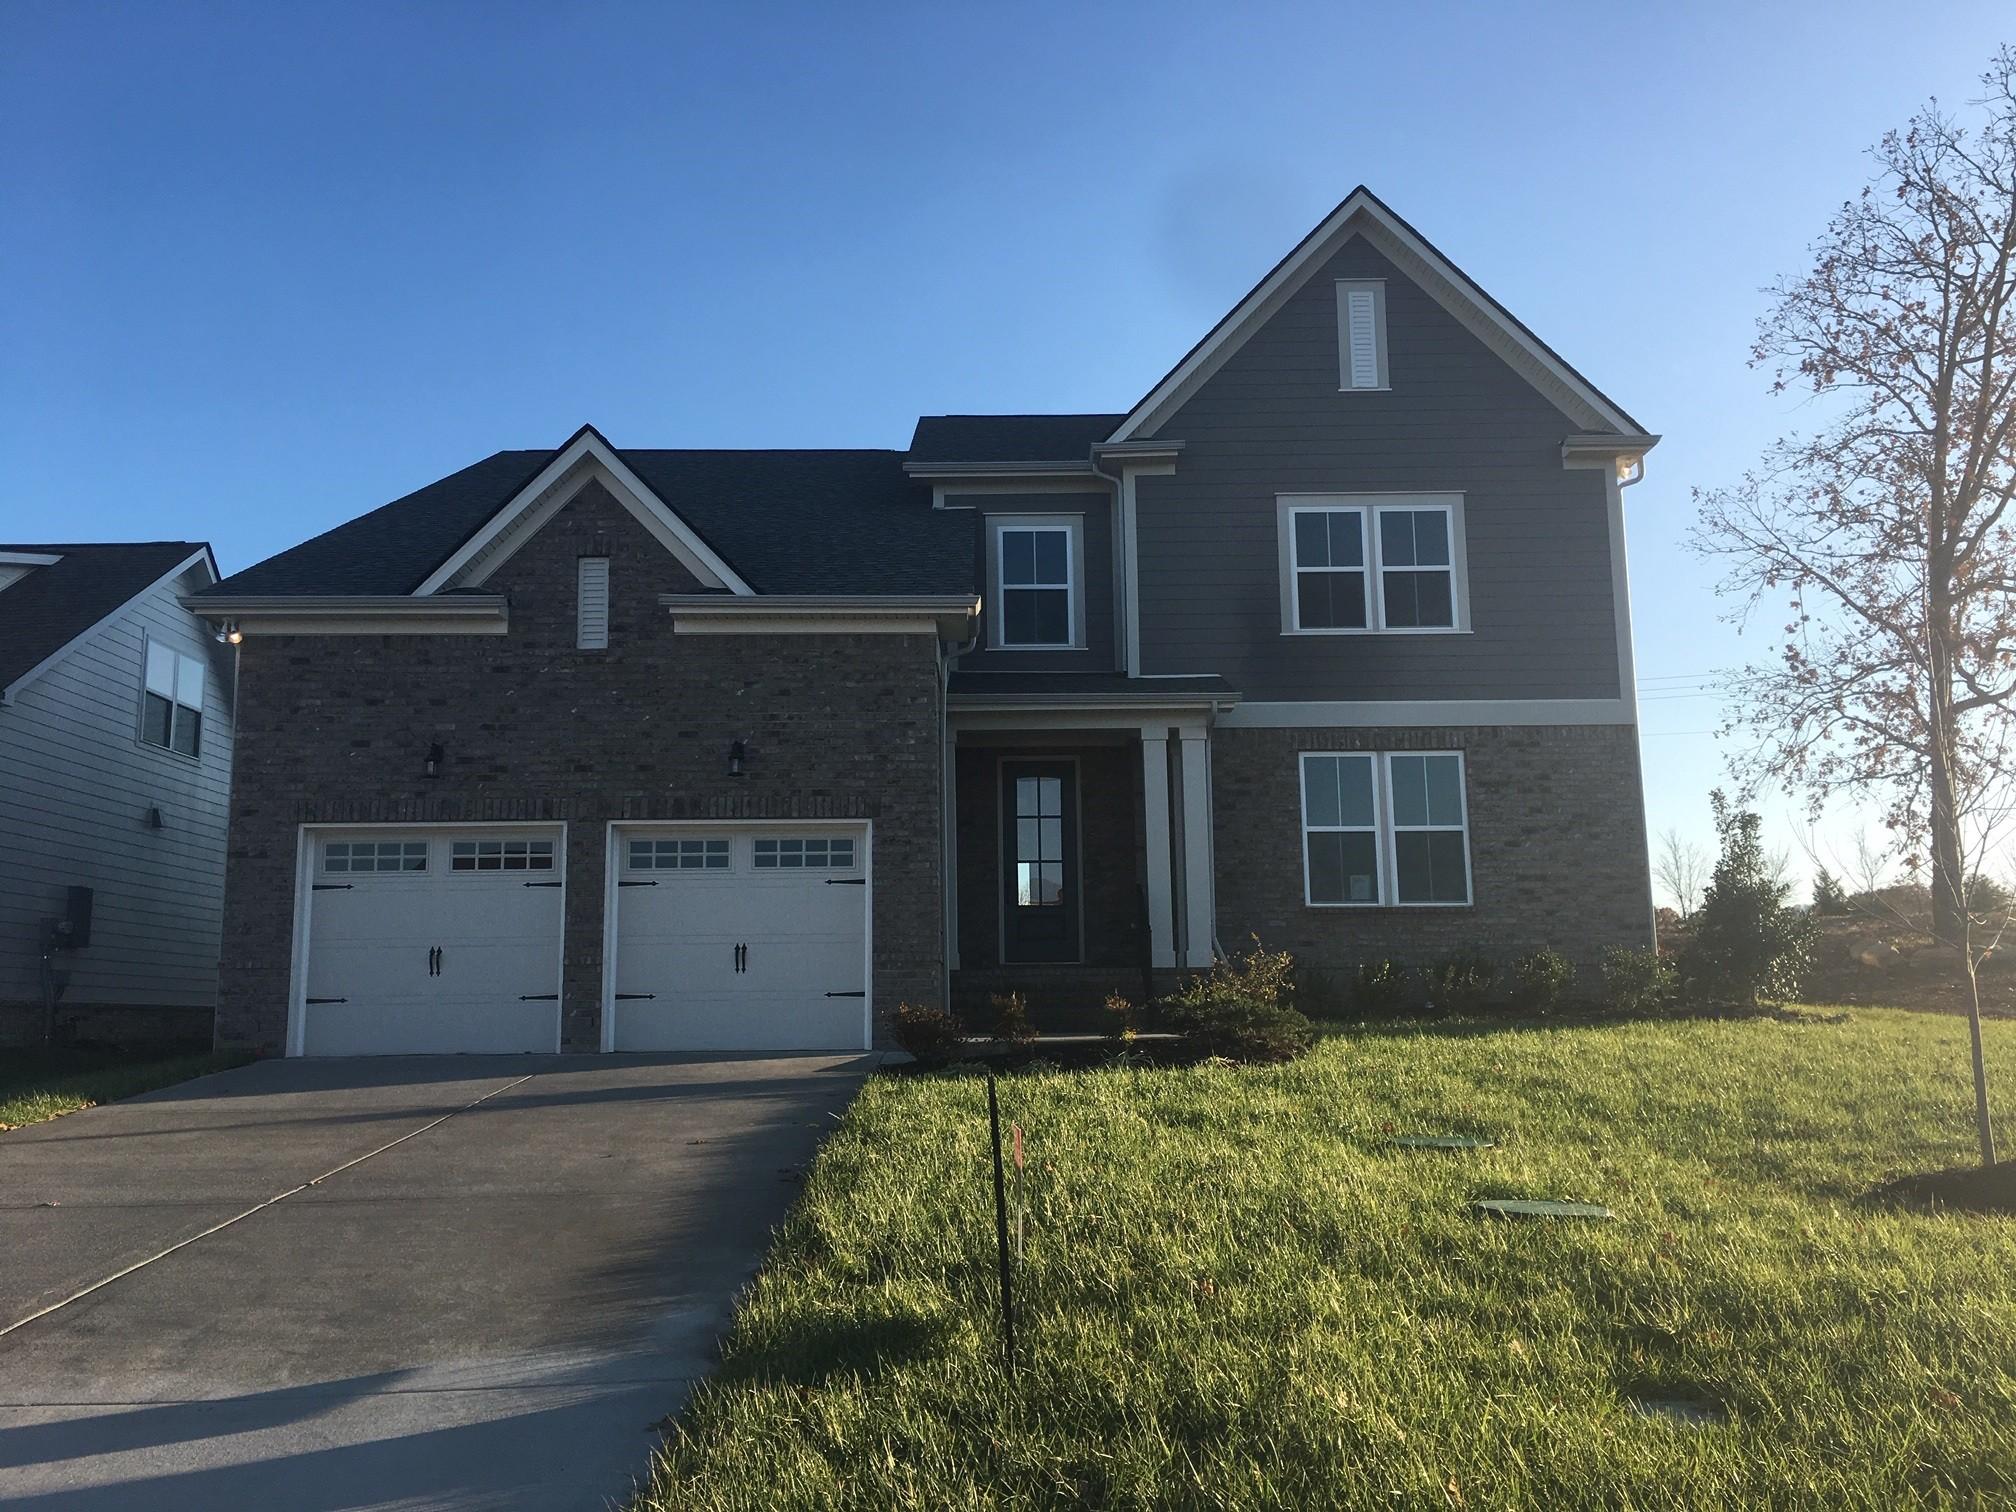 1121 Batbriar Rd (44), Murfreesboro, TN 37128 - Murfreesboro, TN real estate listing